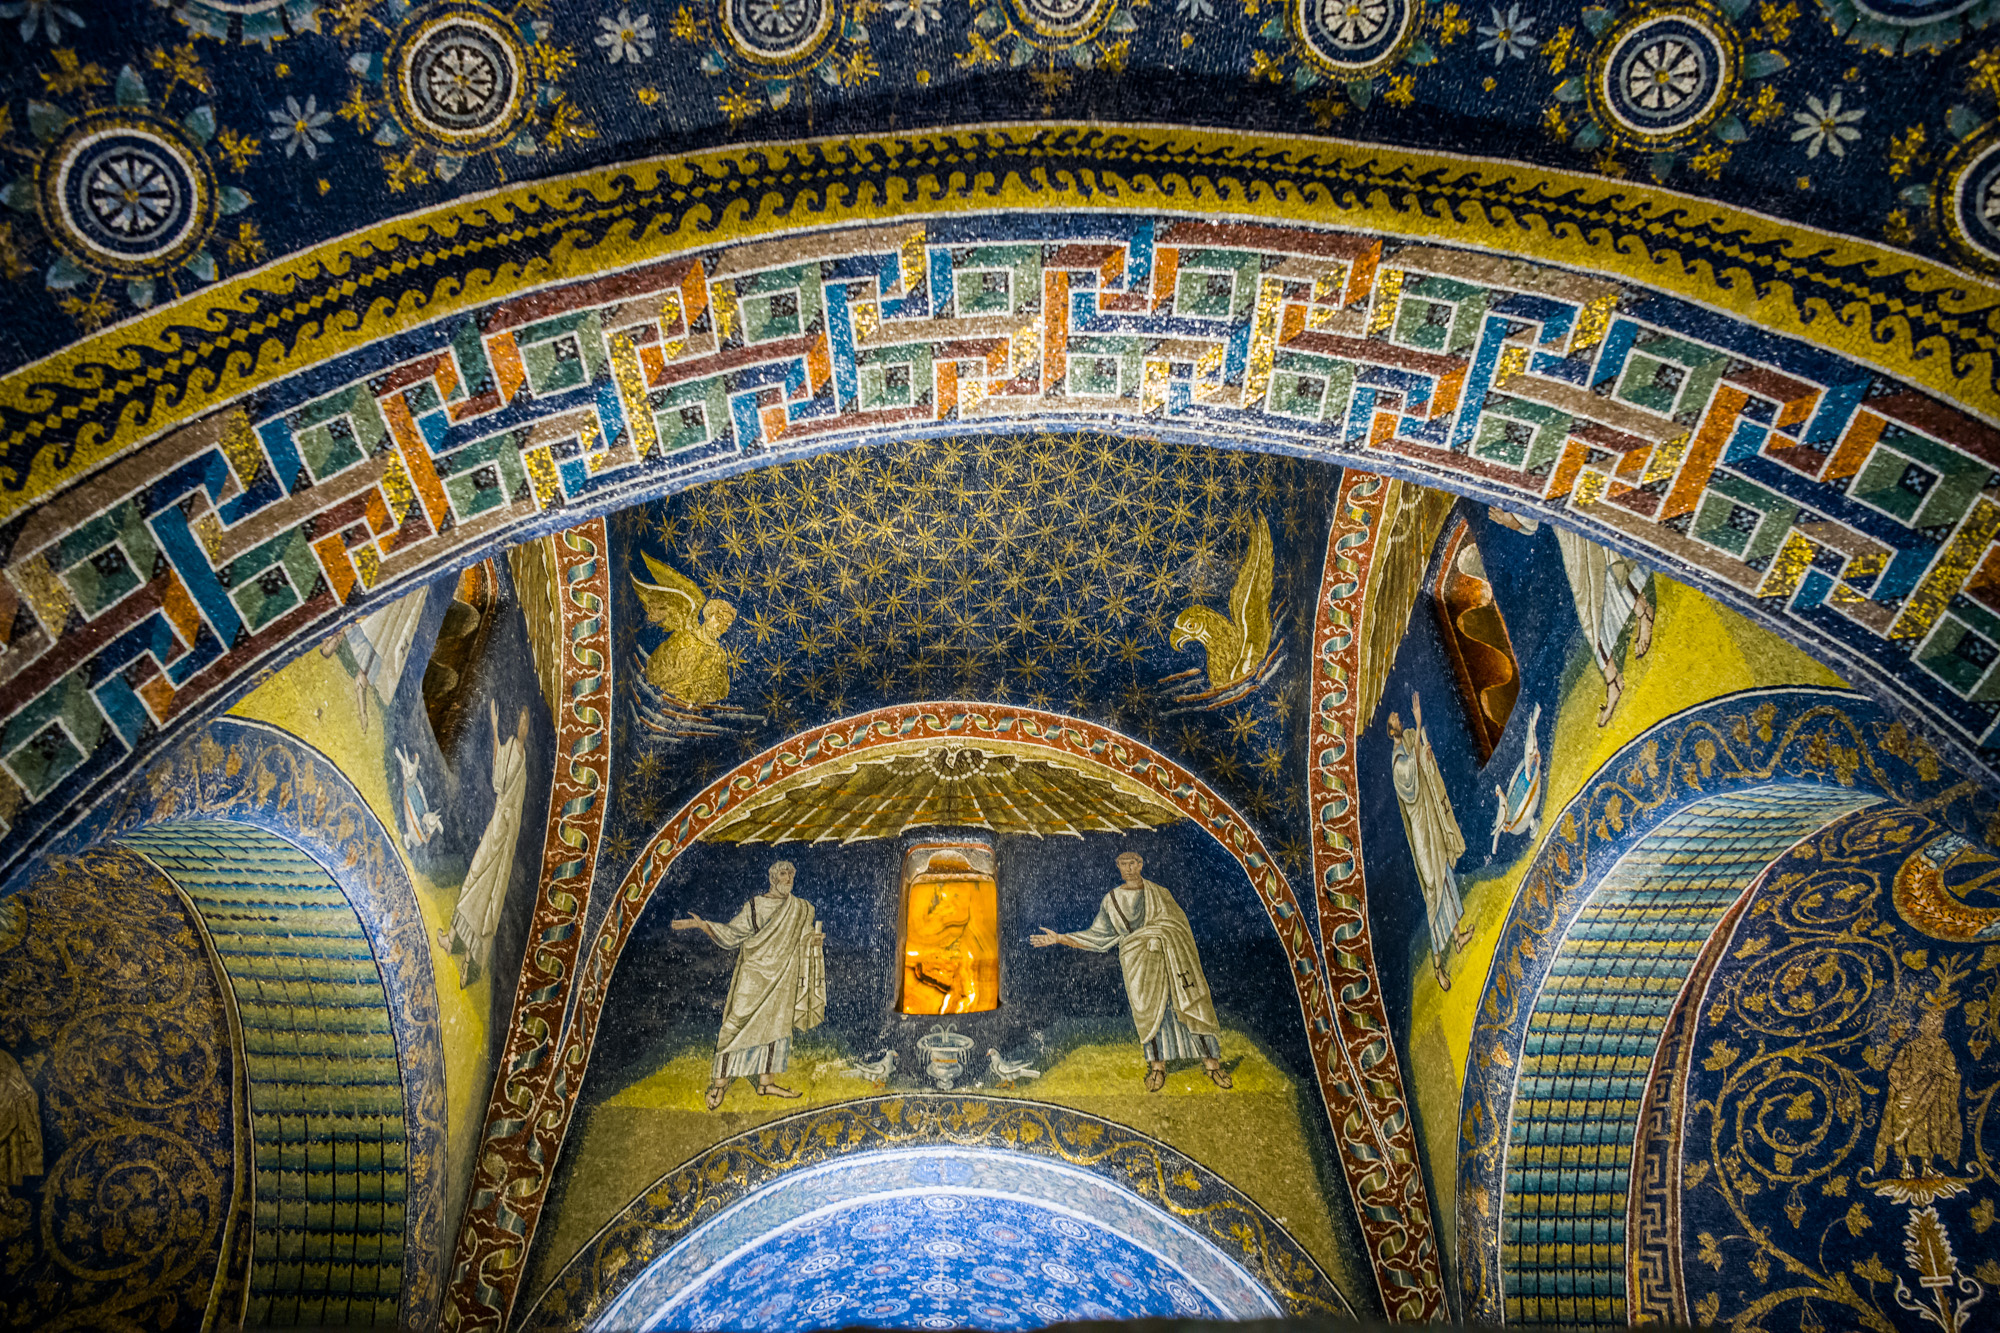 The Mosaics of the Mausoleum of Galla Placidia. The sun's light shines through windows of cut stone.